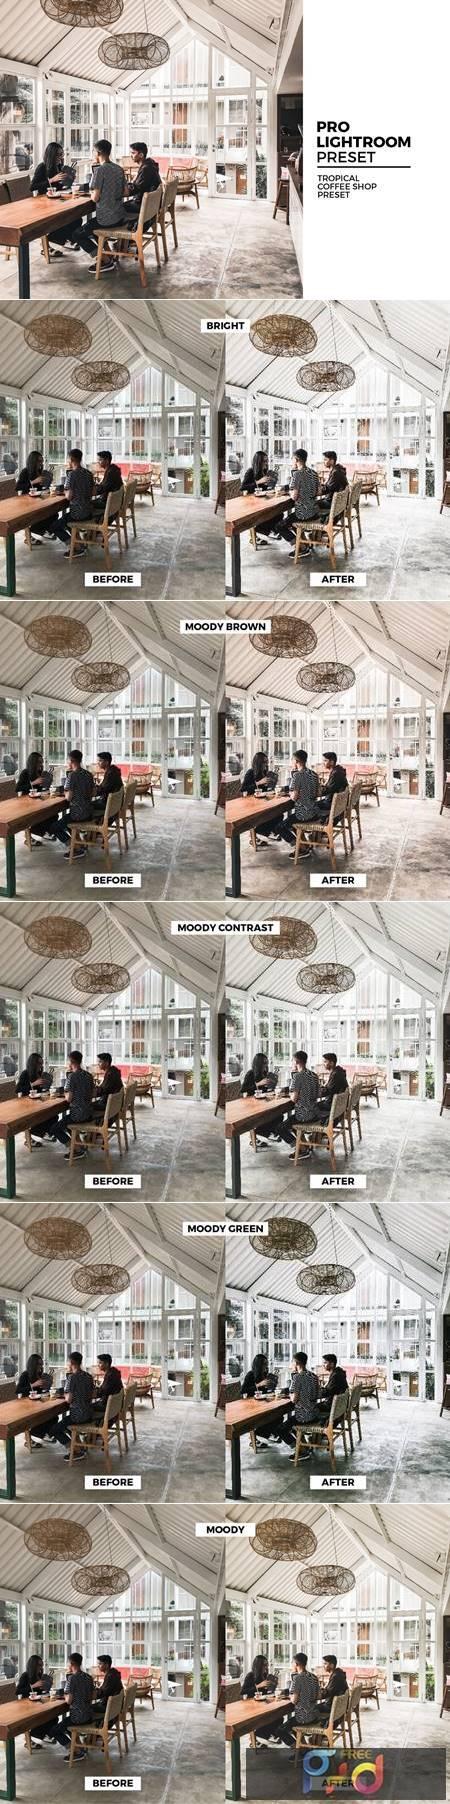 Tropical Coffee Lightroom Presets 5982424 1